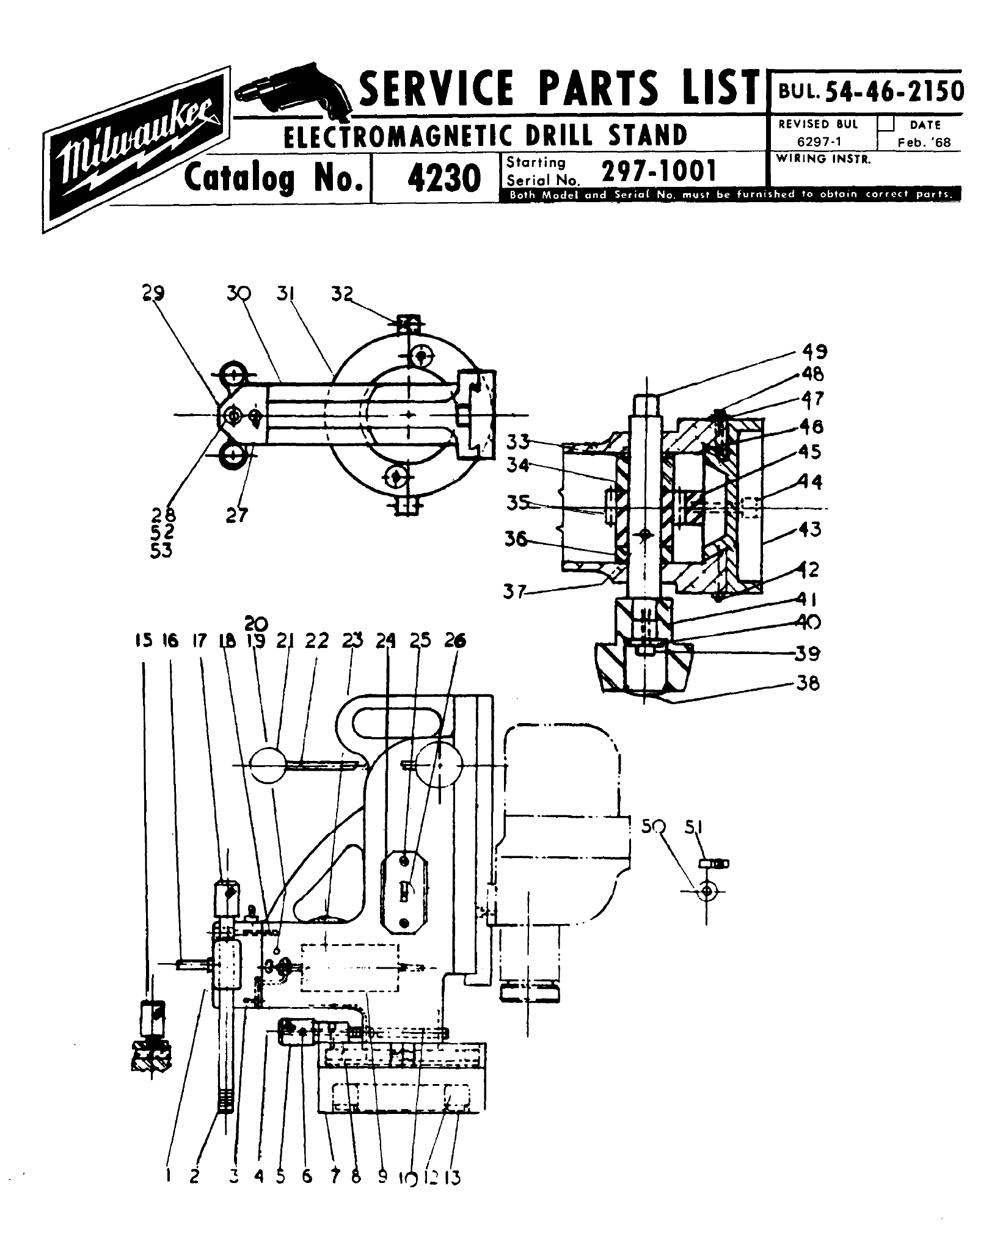 Buy Milwaukee 4230-(297-1001) electromagneticstand